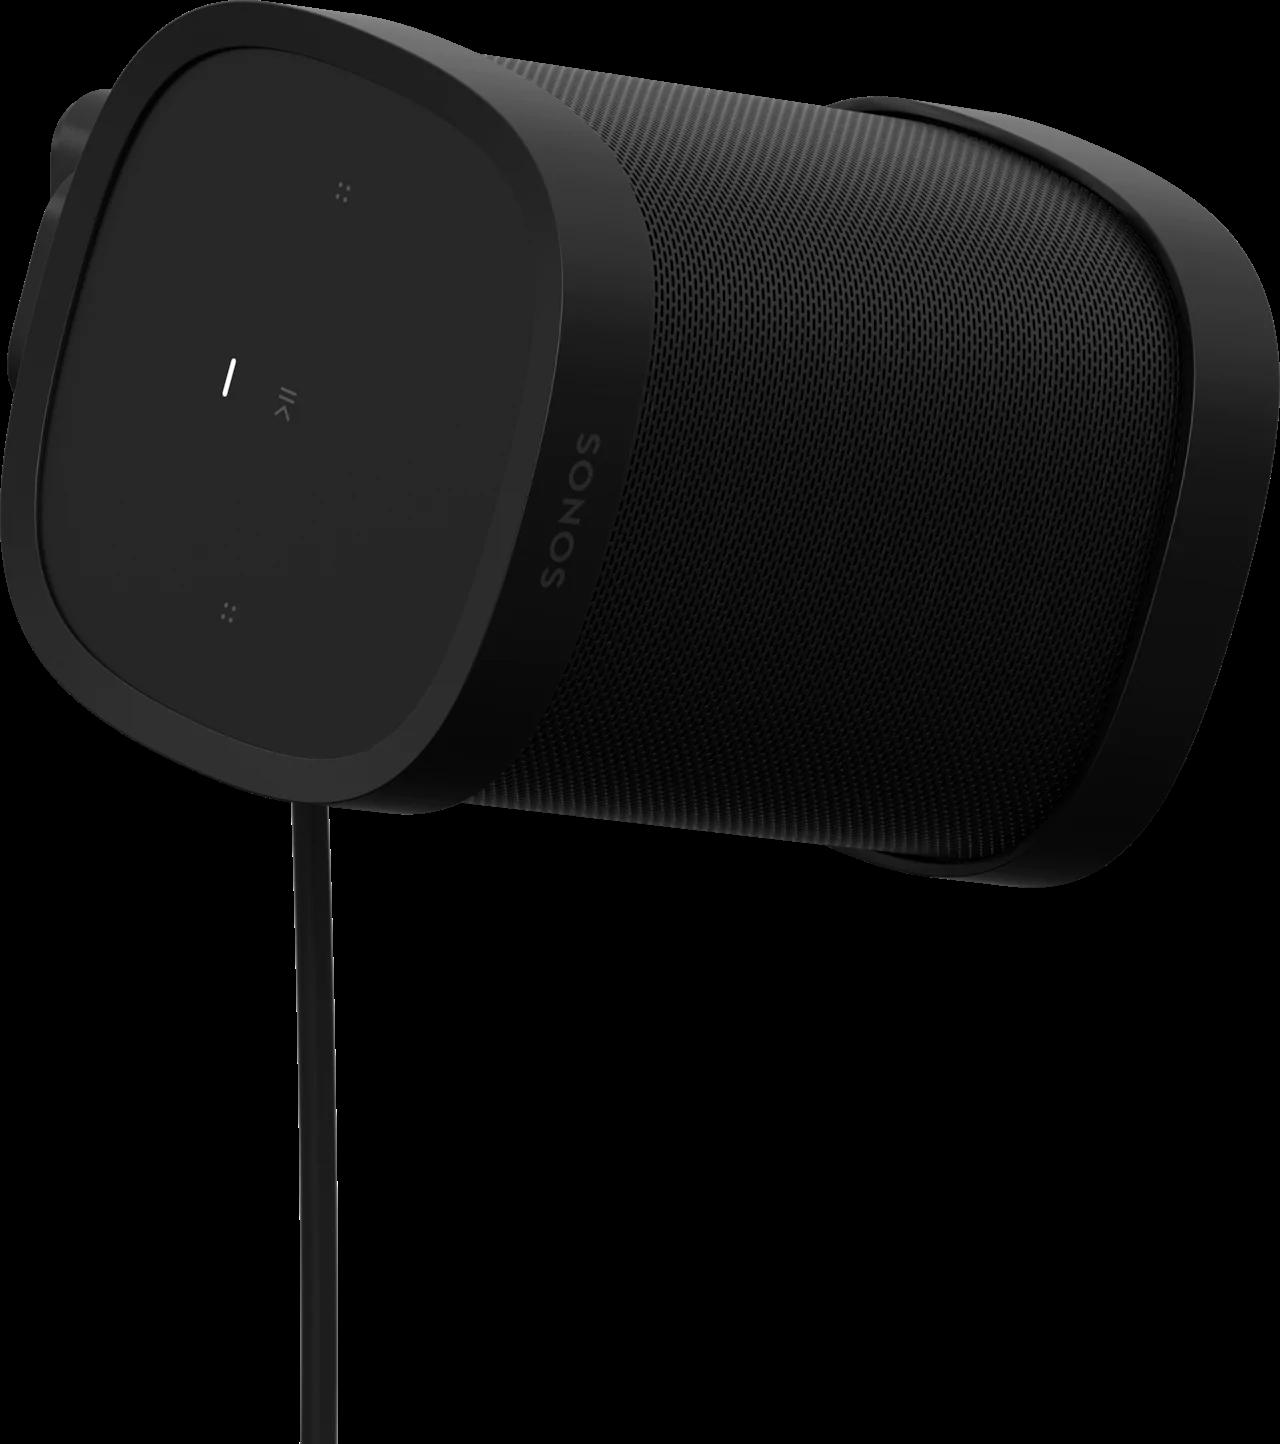 one-mount-mounted-angle-black